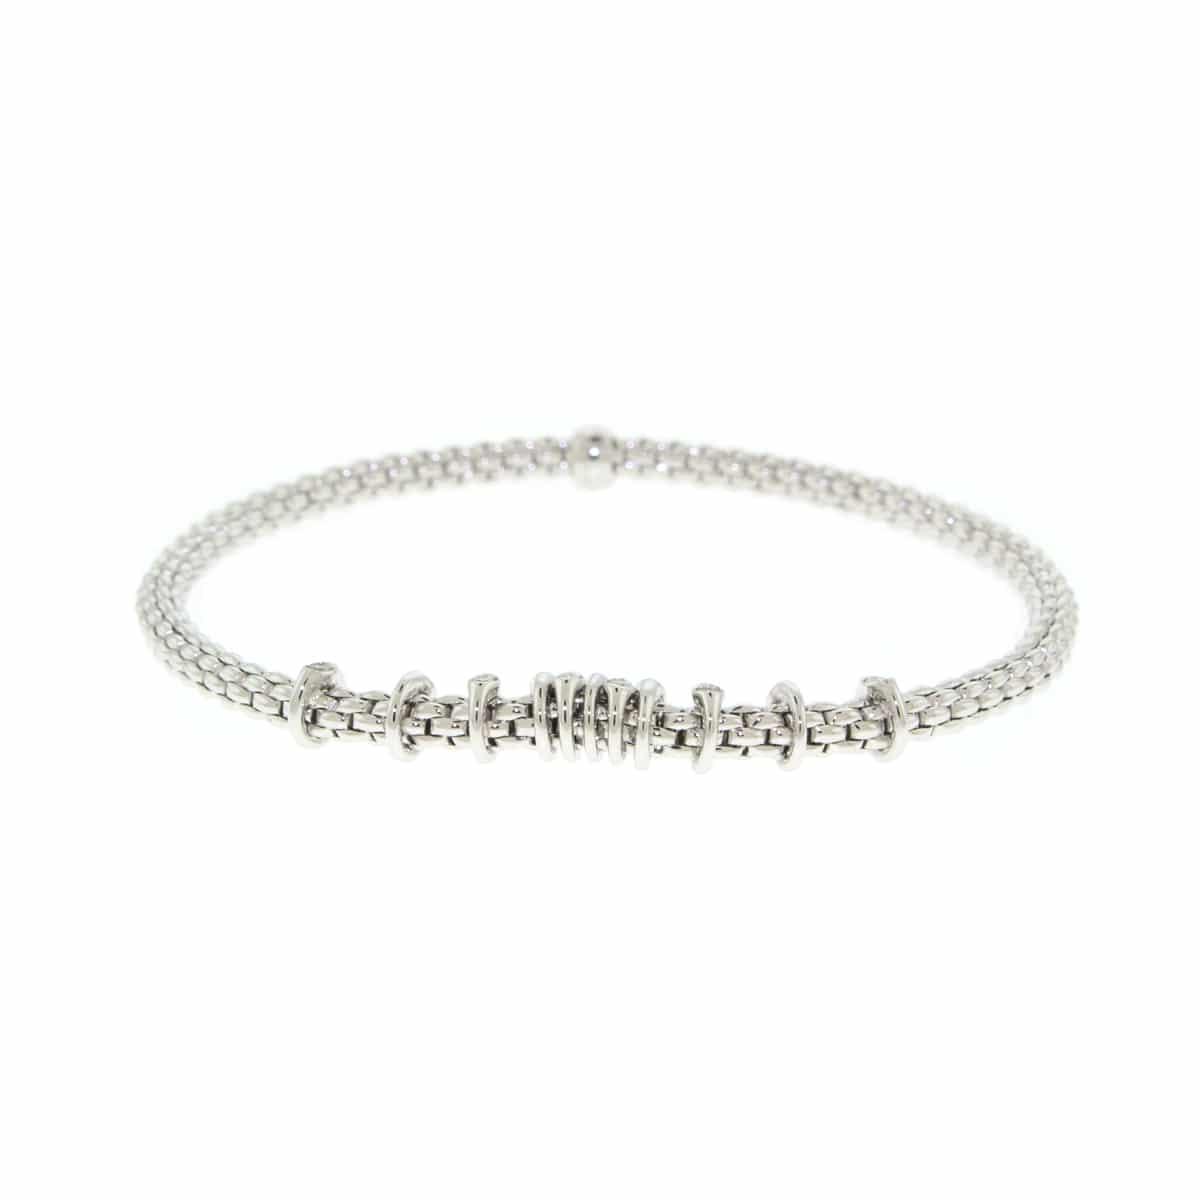 Fope 18k White Gold Flex' It Prima link Bracelet with Diamonds